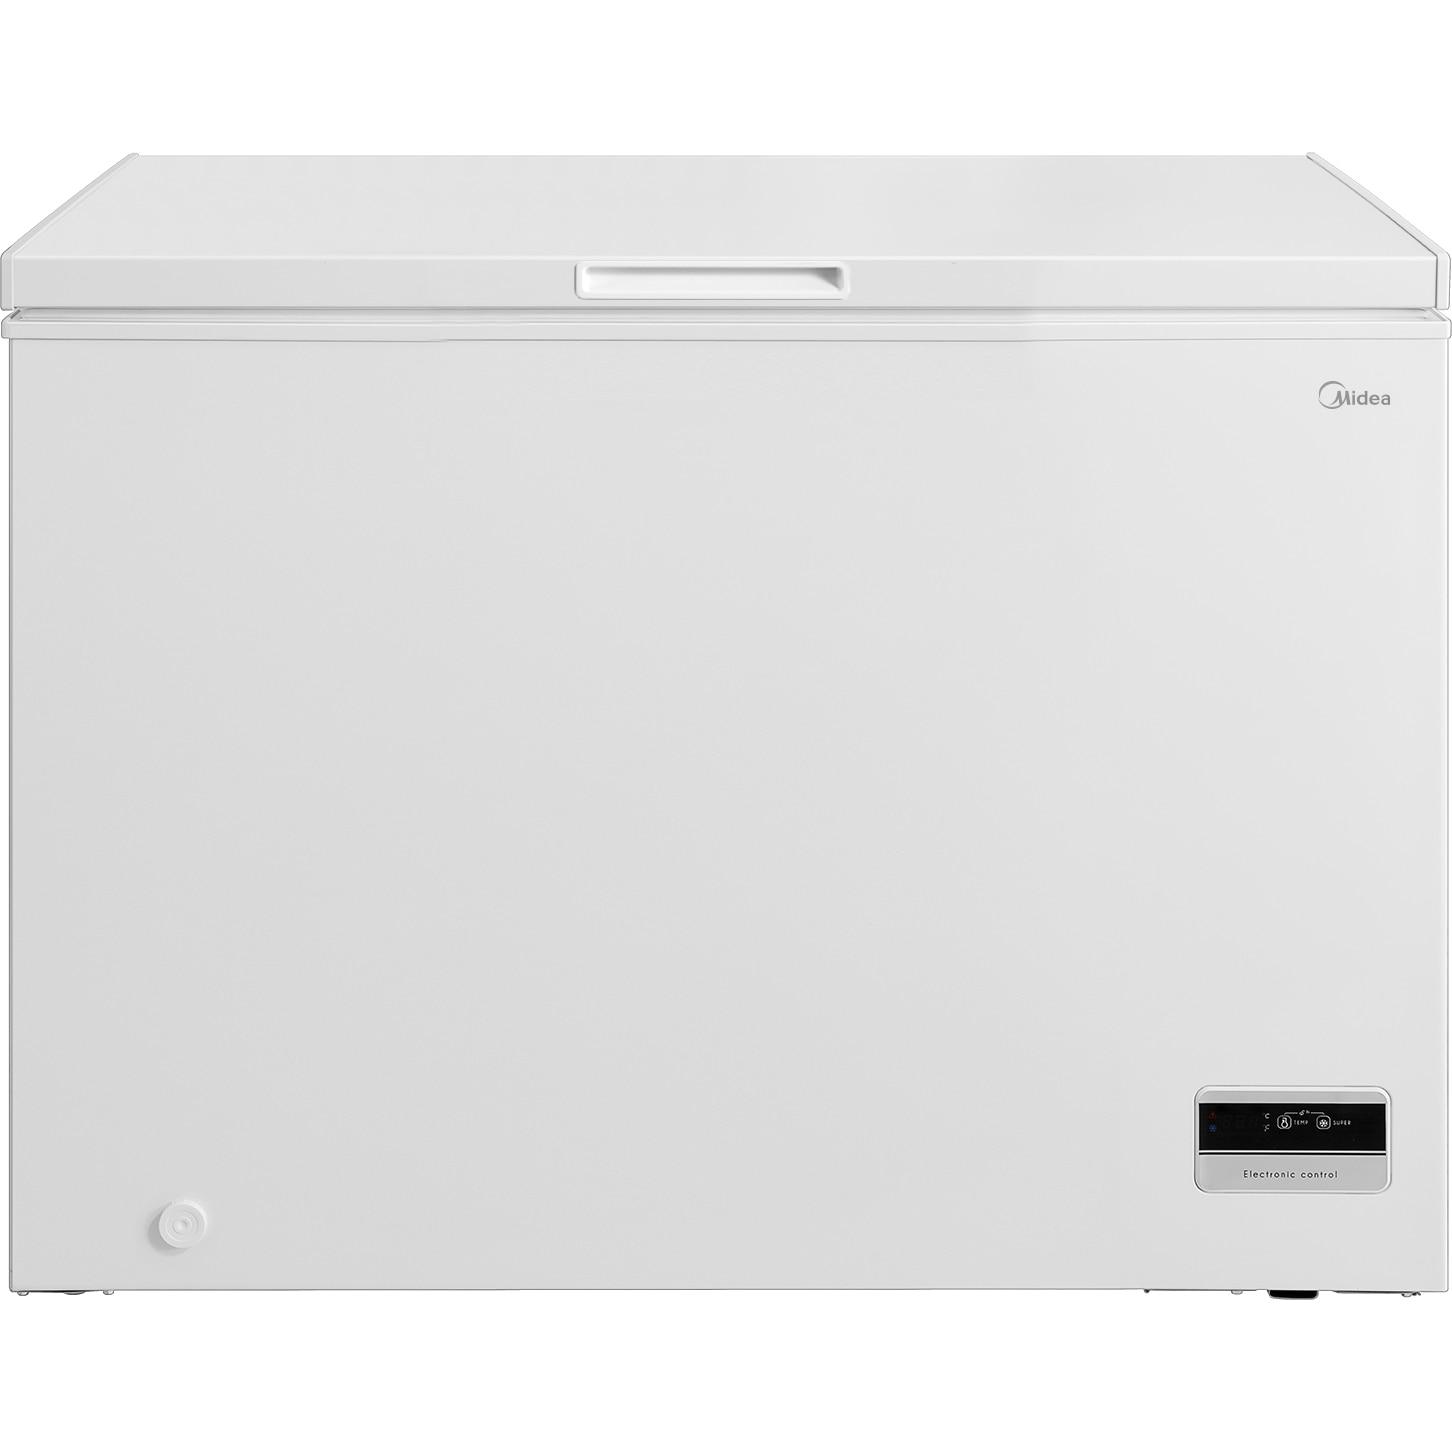 Fotografie Lada frigorifica MIDEA HS-384CEN, 295l, Control Digital, Functie frigider, Display, Clasa A+, Alb